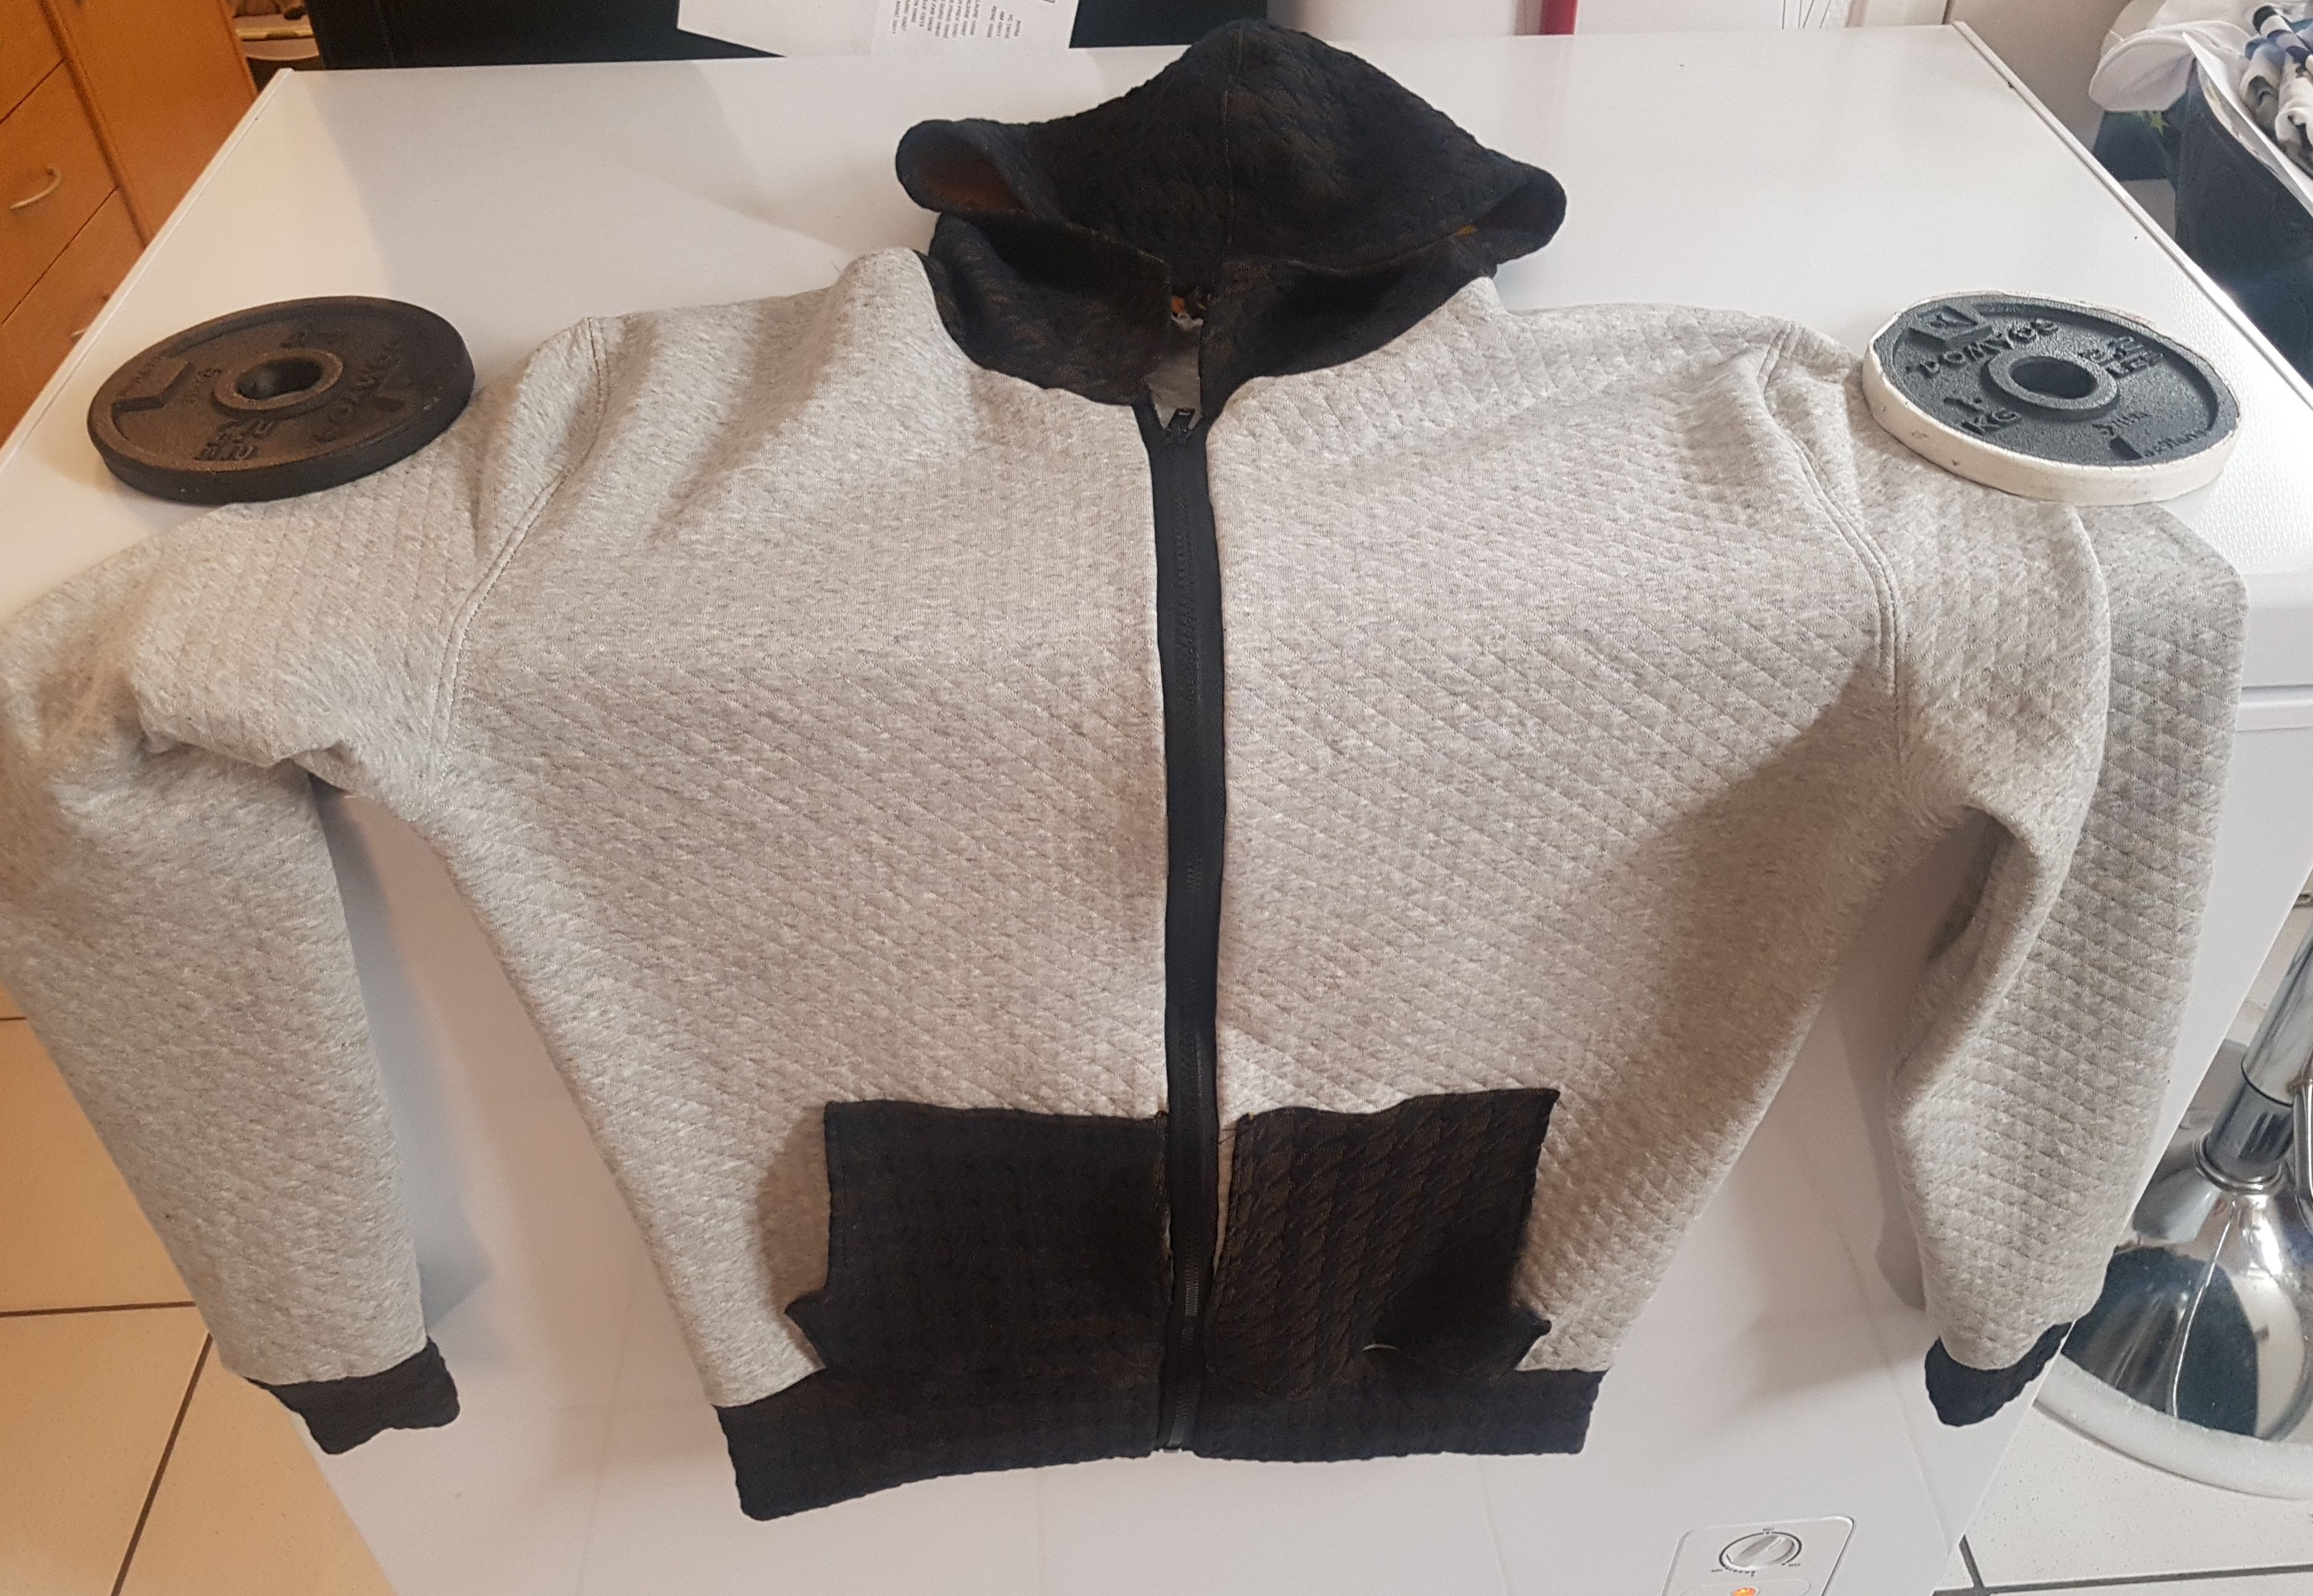 Huey hoodie laying on a washing machine, instead of on a human